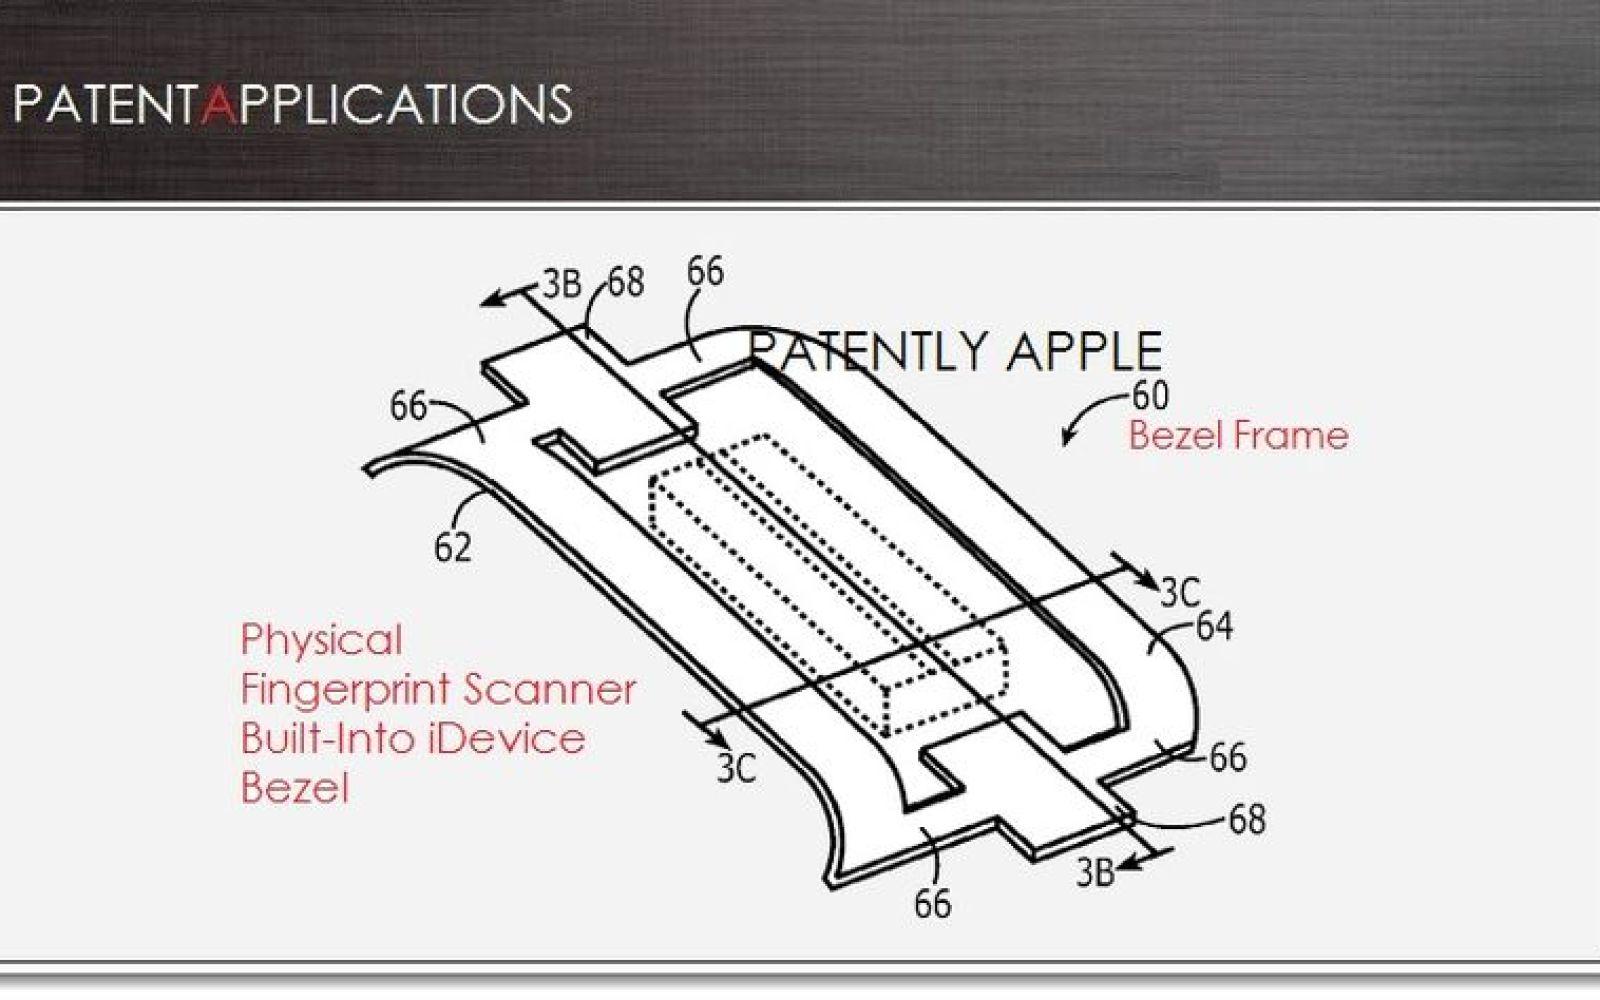 Apple patent application describes fingerprint sensor tech rumored for iPhone 5S